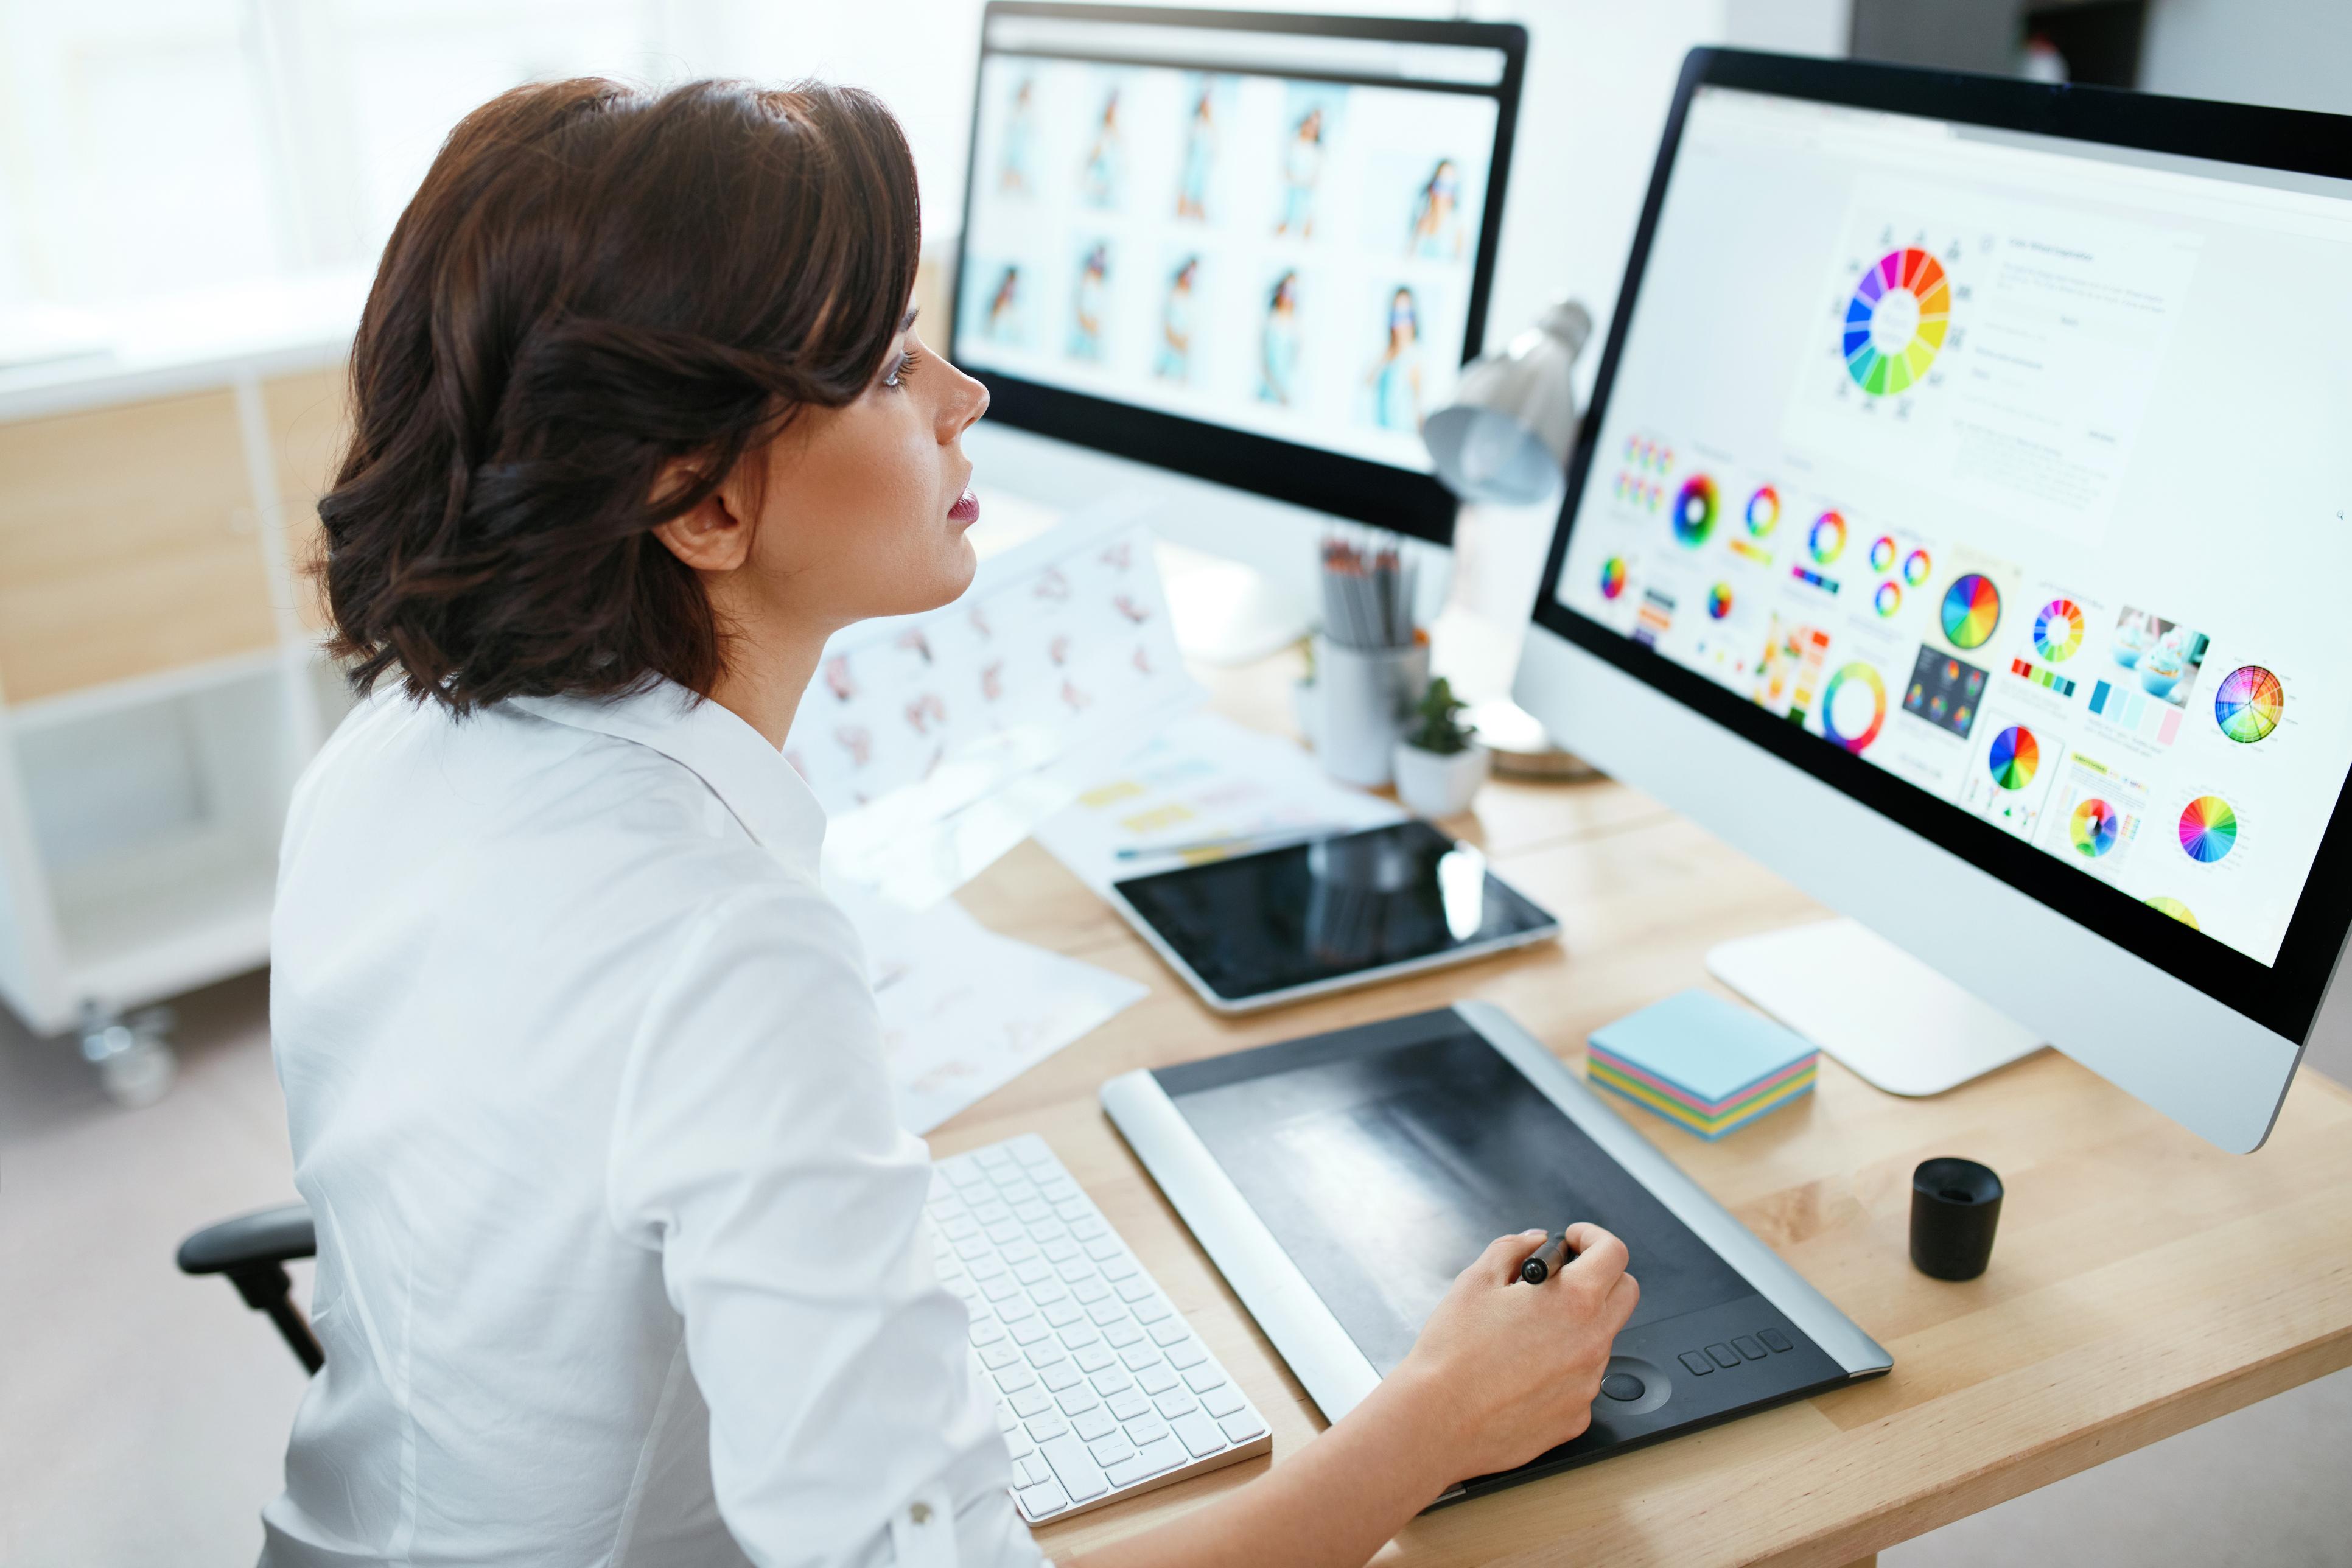 5 Nonprofit Website Design Elements You Should Include